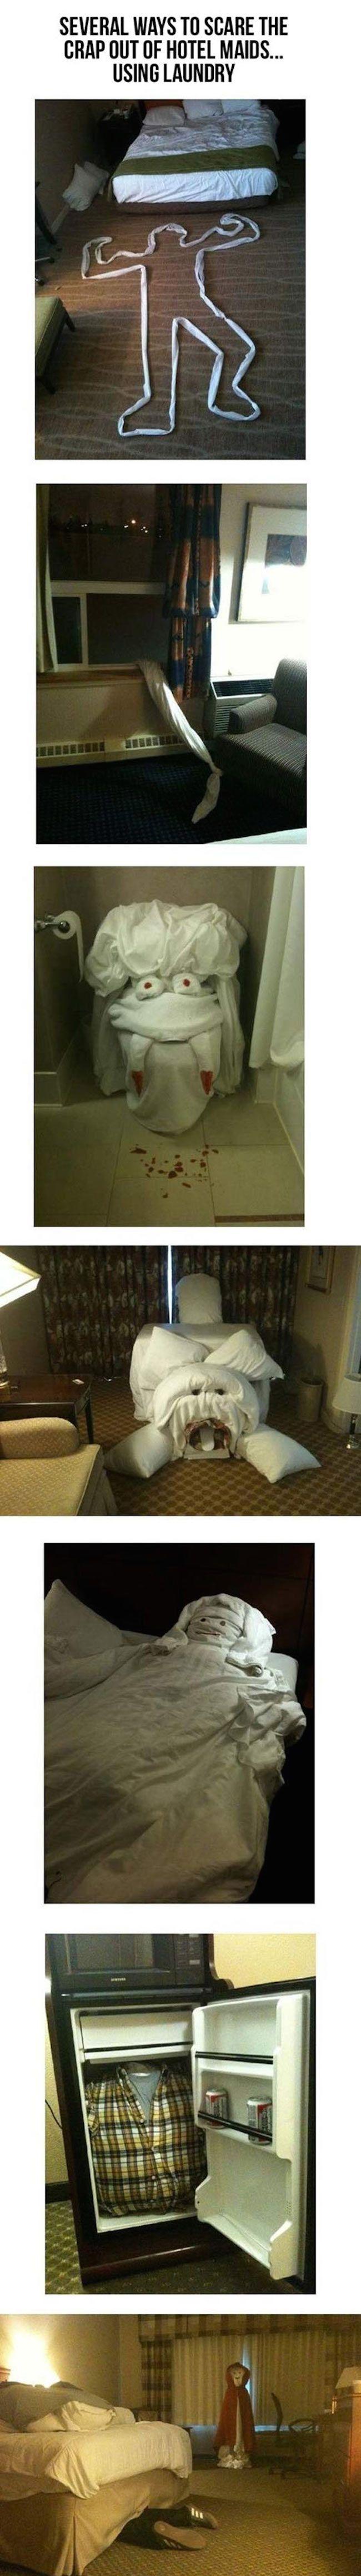 Best 25+ Scary pranks ideas on Pinterest | Funny scary pranks ...